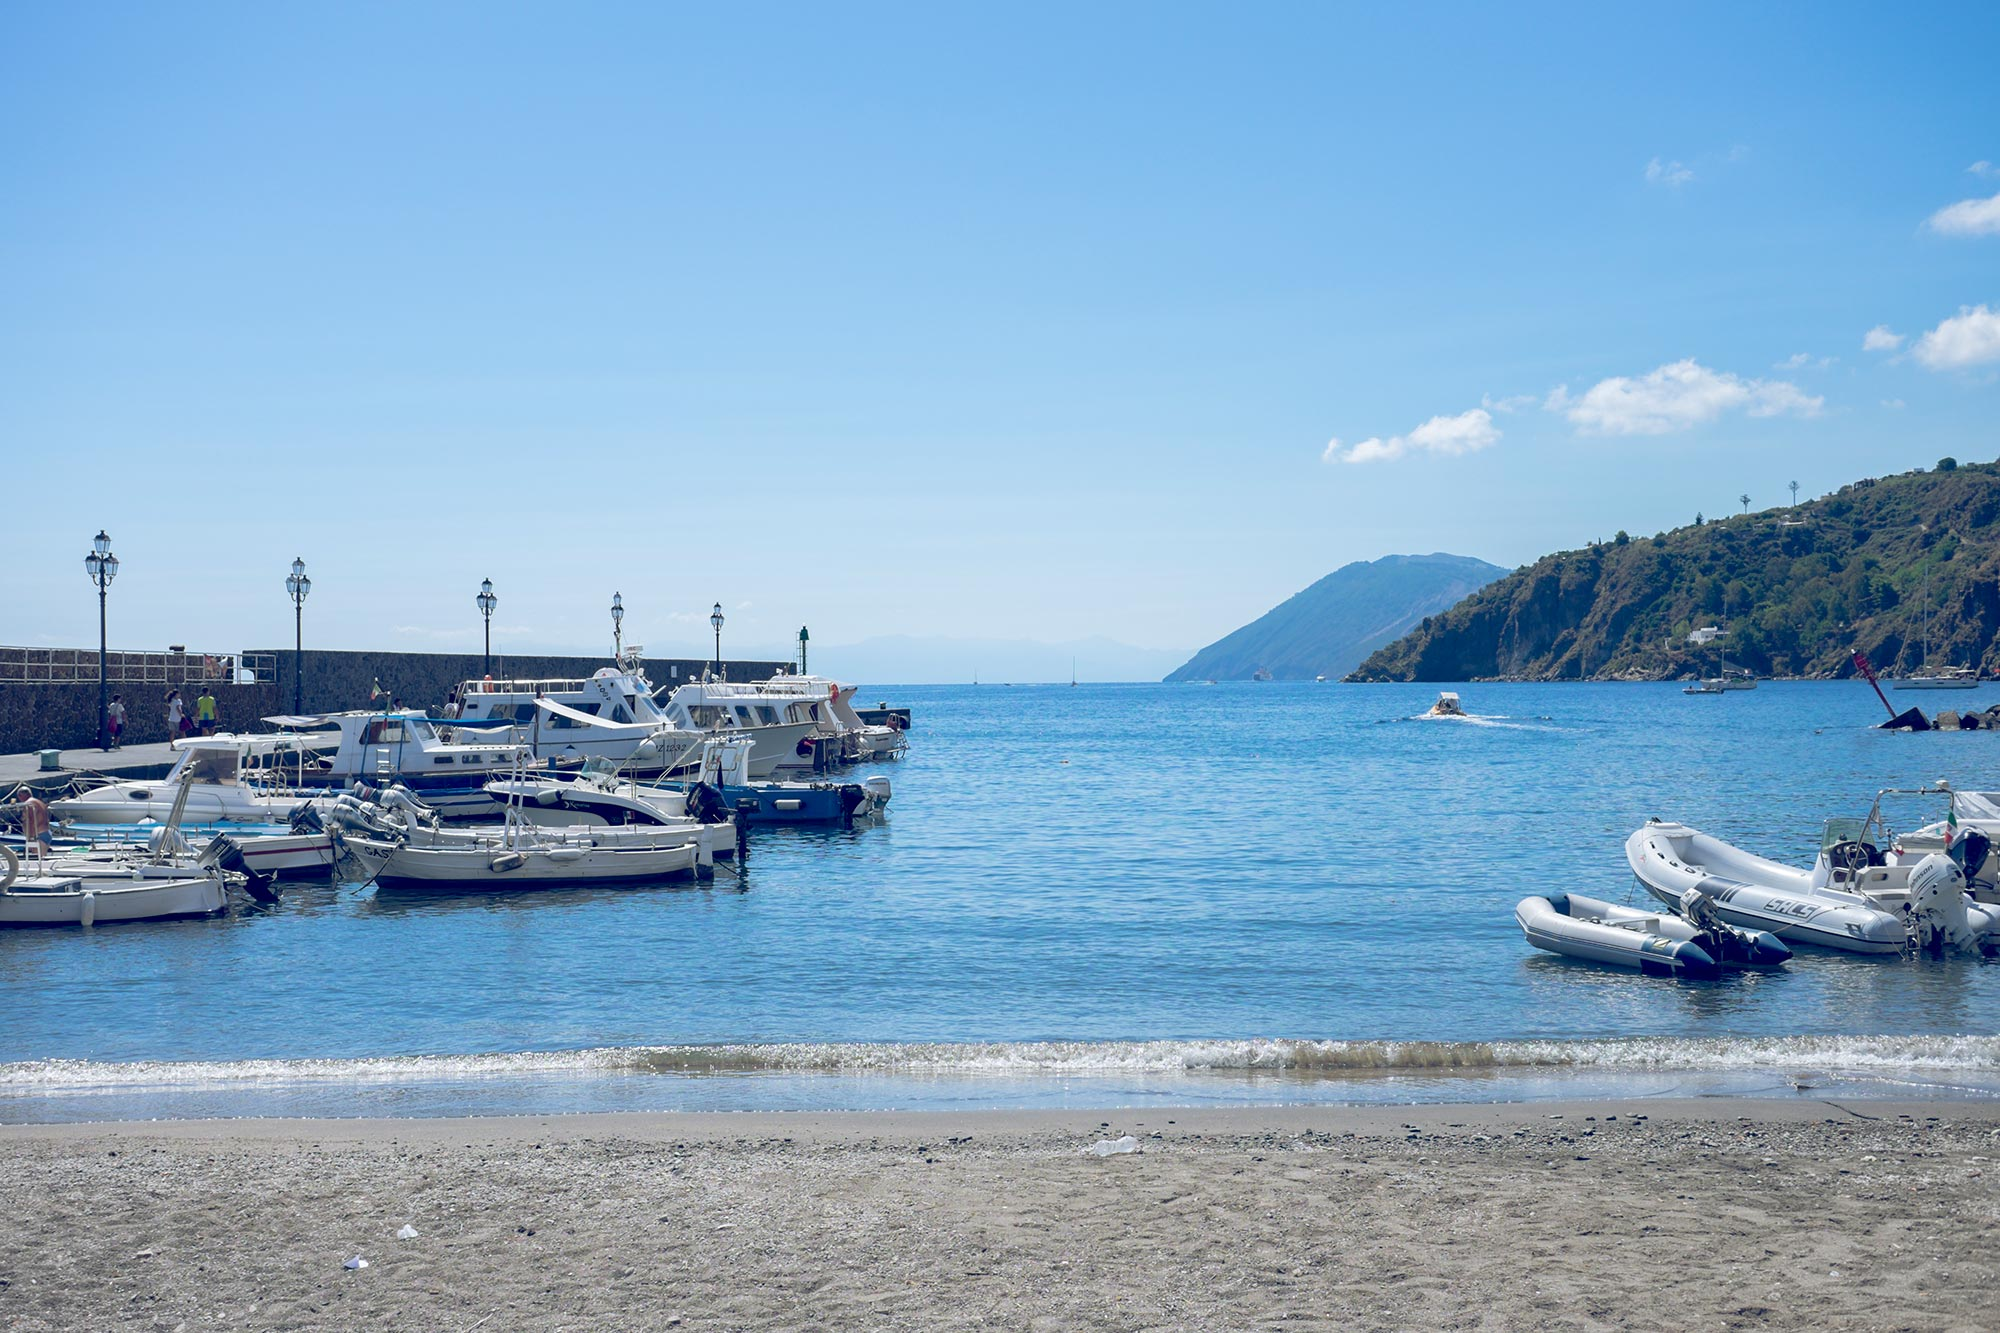 italy-sicilia-eolie-italy-sicilia-eolie-lipari-marina-corta-boats